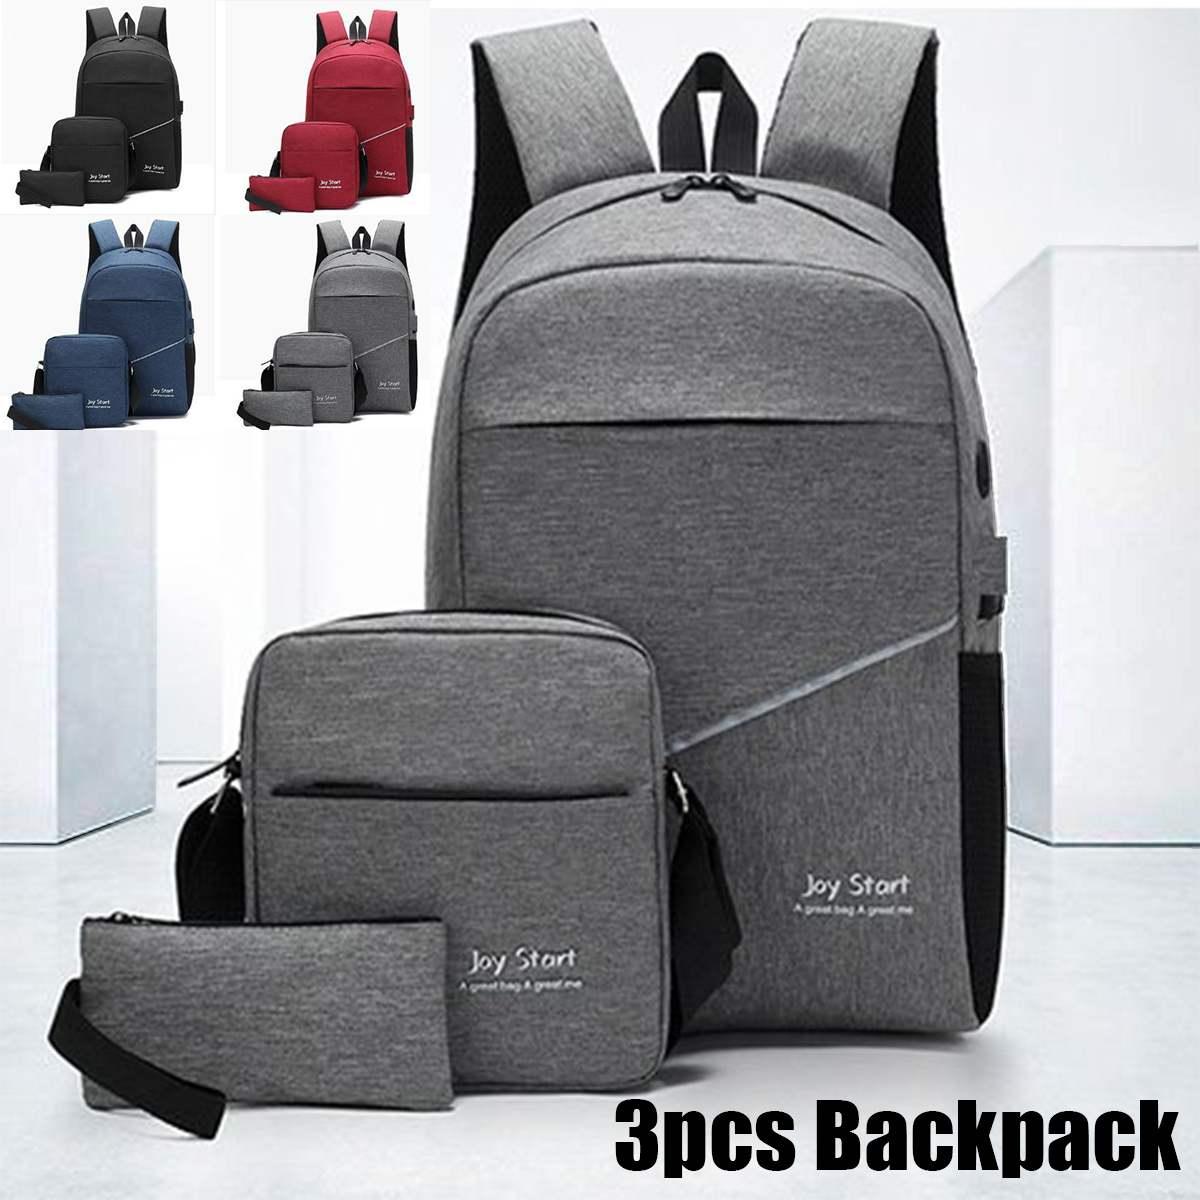 3PCS Nylon Men Women Usb Charging Backpack With Headset Hole Boys Girl School Backpack Shoulder Bag Waterproof Laptop Travel Bag